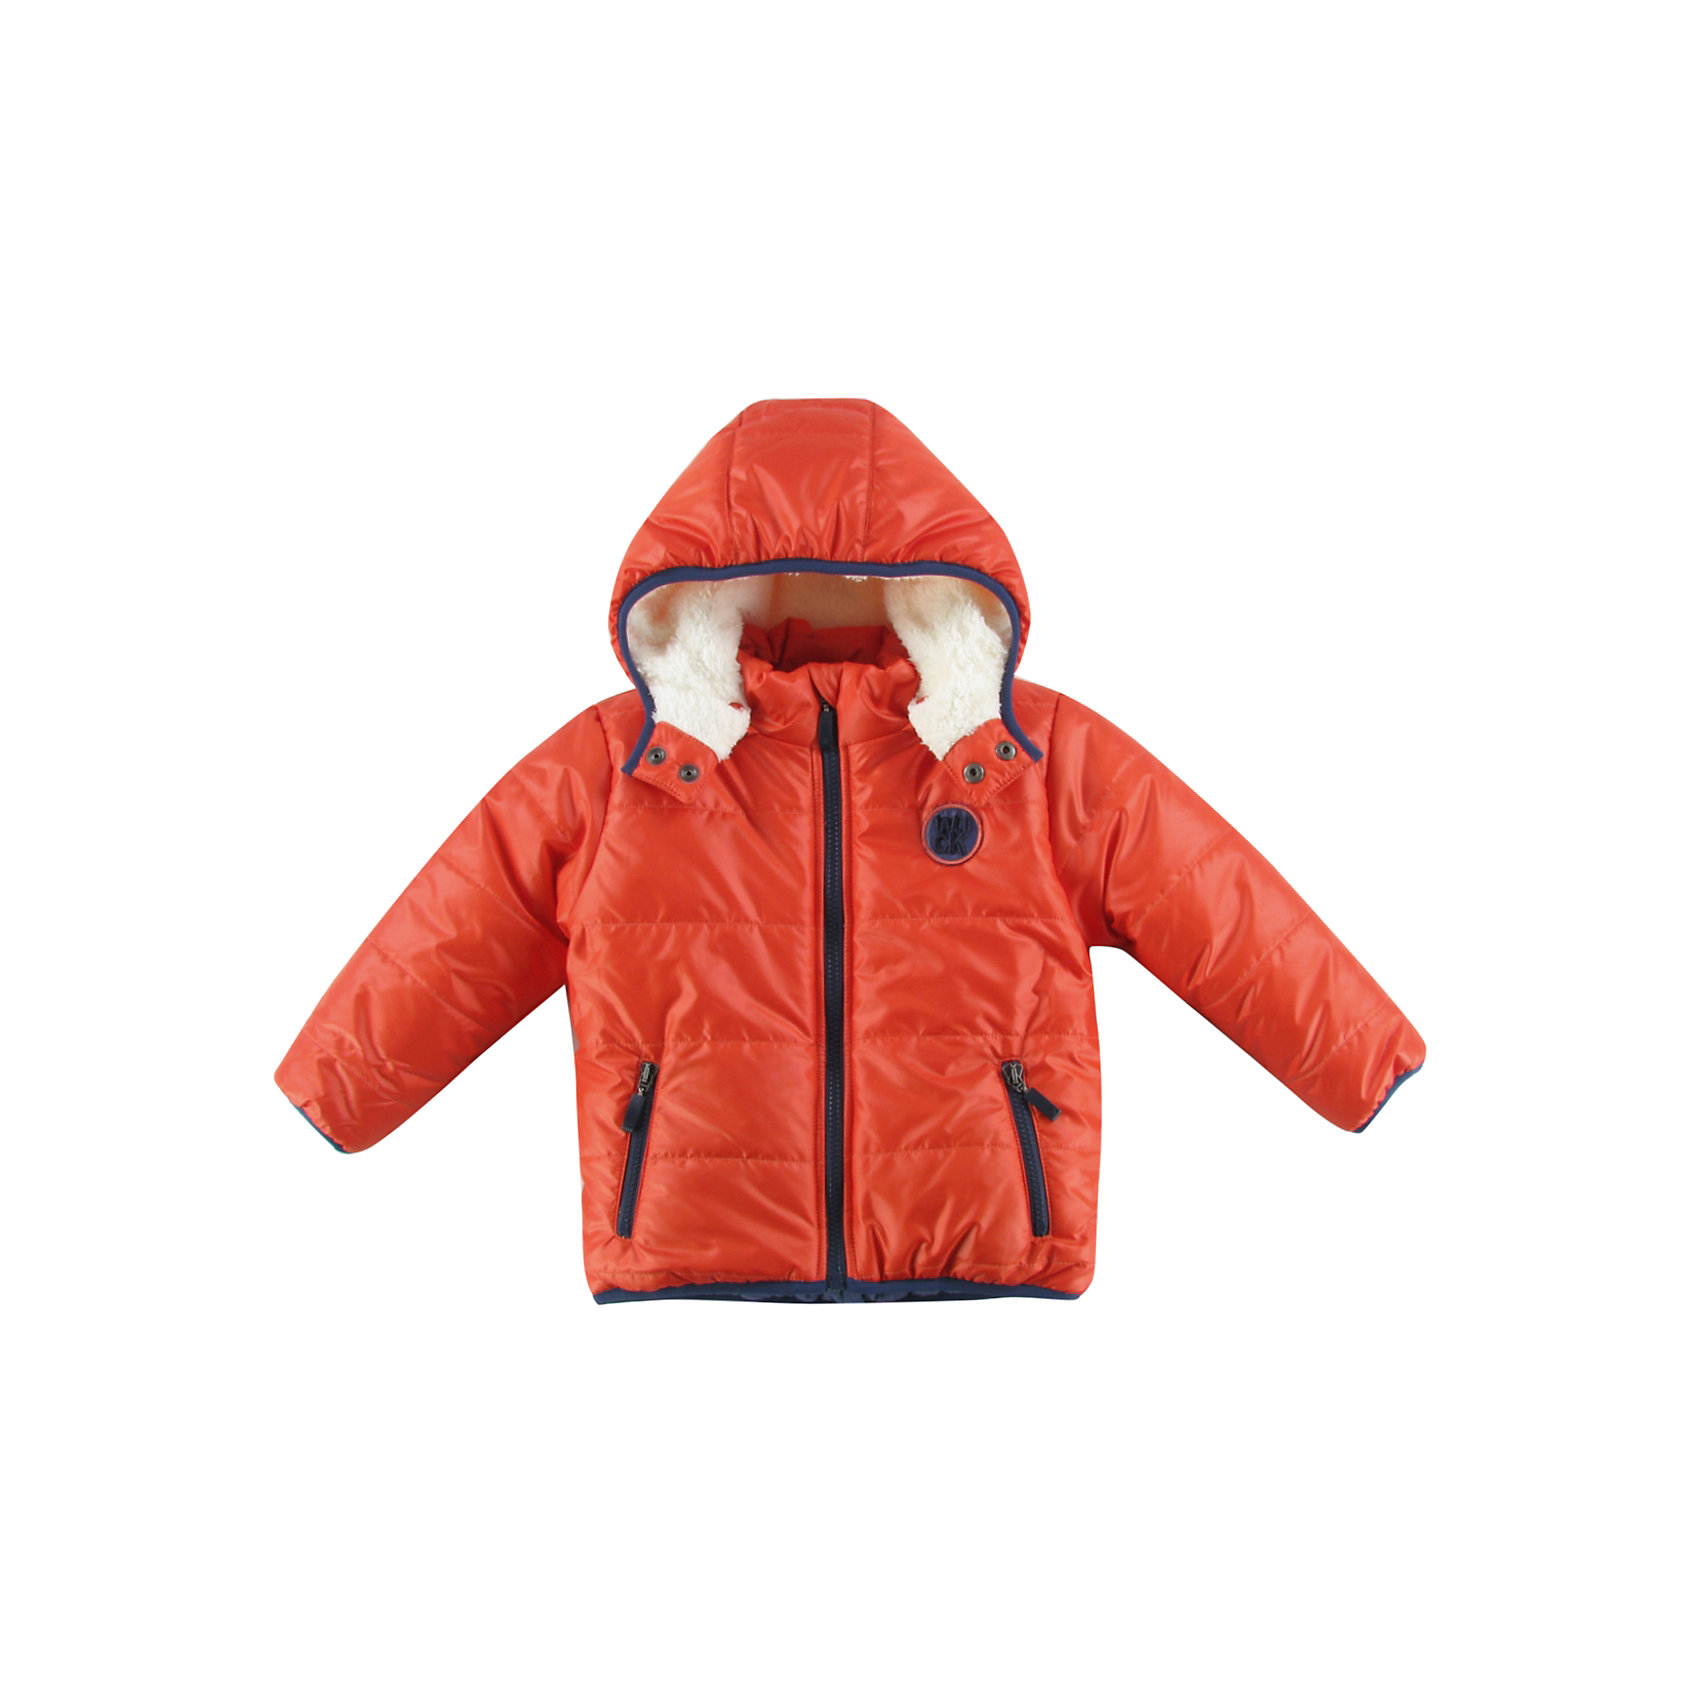 Куртка утепленная для мальчика WojcikВерхняя одежда<br>Куртка утепленная для мальчика Wojcik<br>Состав:<br>Полиэстер 100%<br><br>Ширина мм: 356<br>Глубина мм: 10<br>Высота мм: 245<br>Вес г: 519<br>Цвет: красный<br>Возраст от месяцев: 12<br>Возраст до месяцев: 18<br>Пол: Мужской<br>Возраст: Детский<br>Размер: 86,80,74,98,92<br>SKU: 5591785